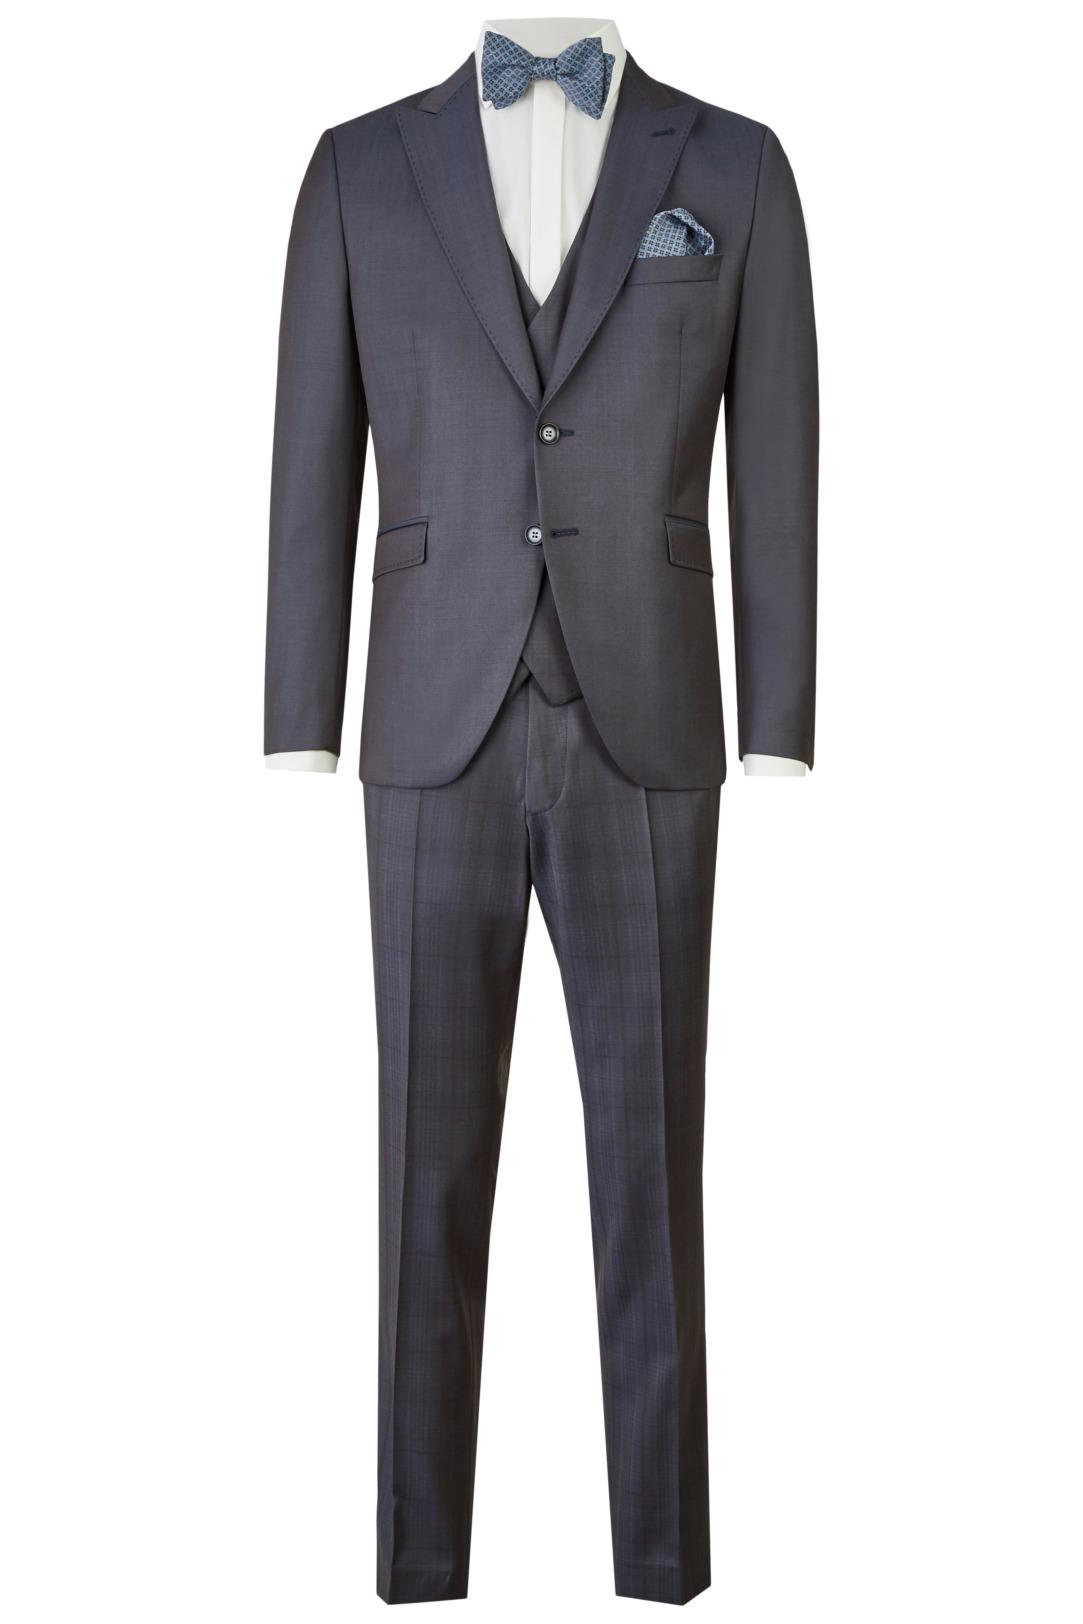 Wilvorst After Six Hochzeitsanzug Männer Mode Bräutigam klassische Form grau wil_0121_otf_as-look-6_1